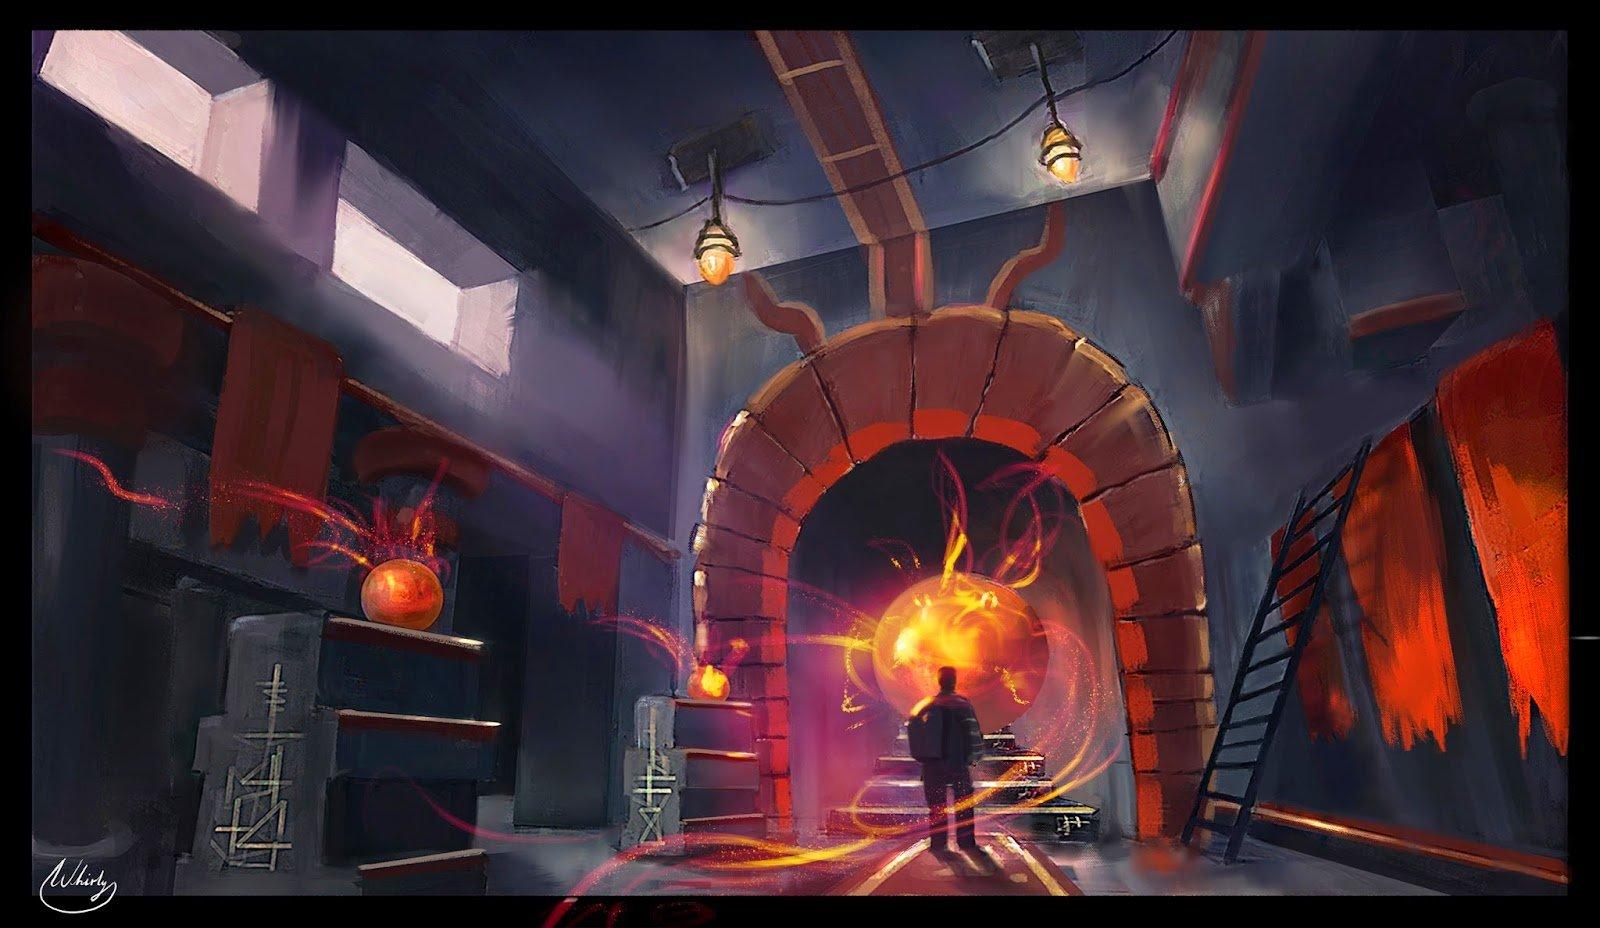 simon-myers-orange-ball-interior.jpg